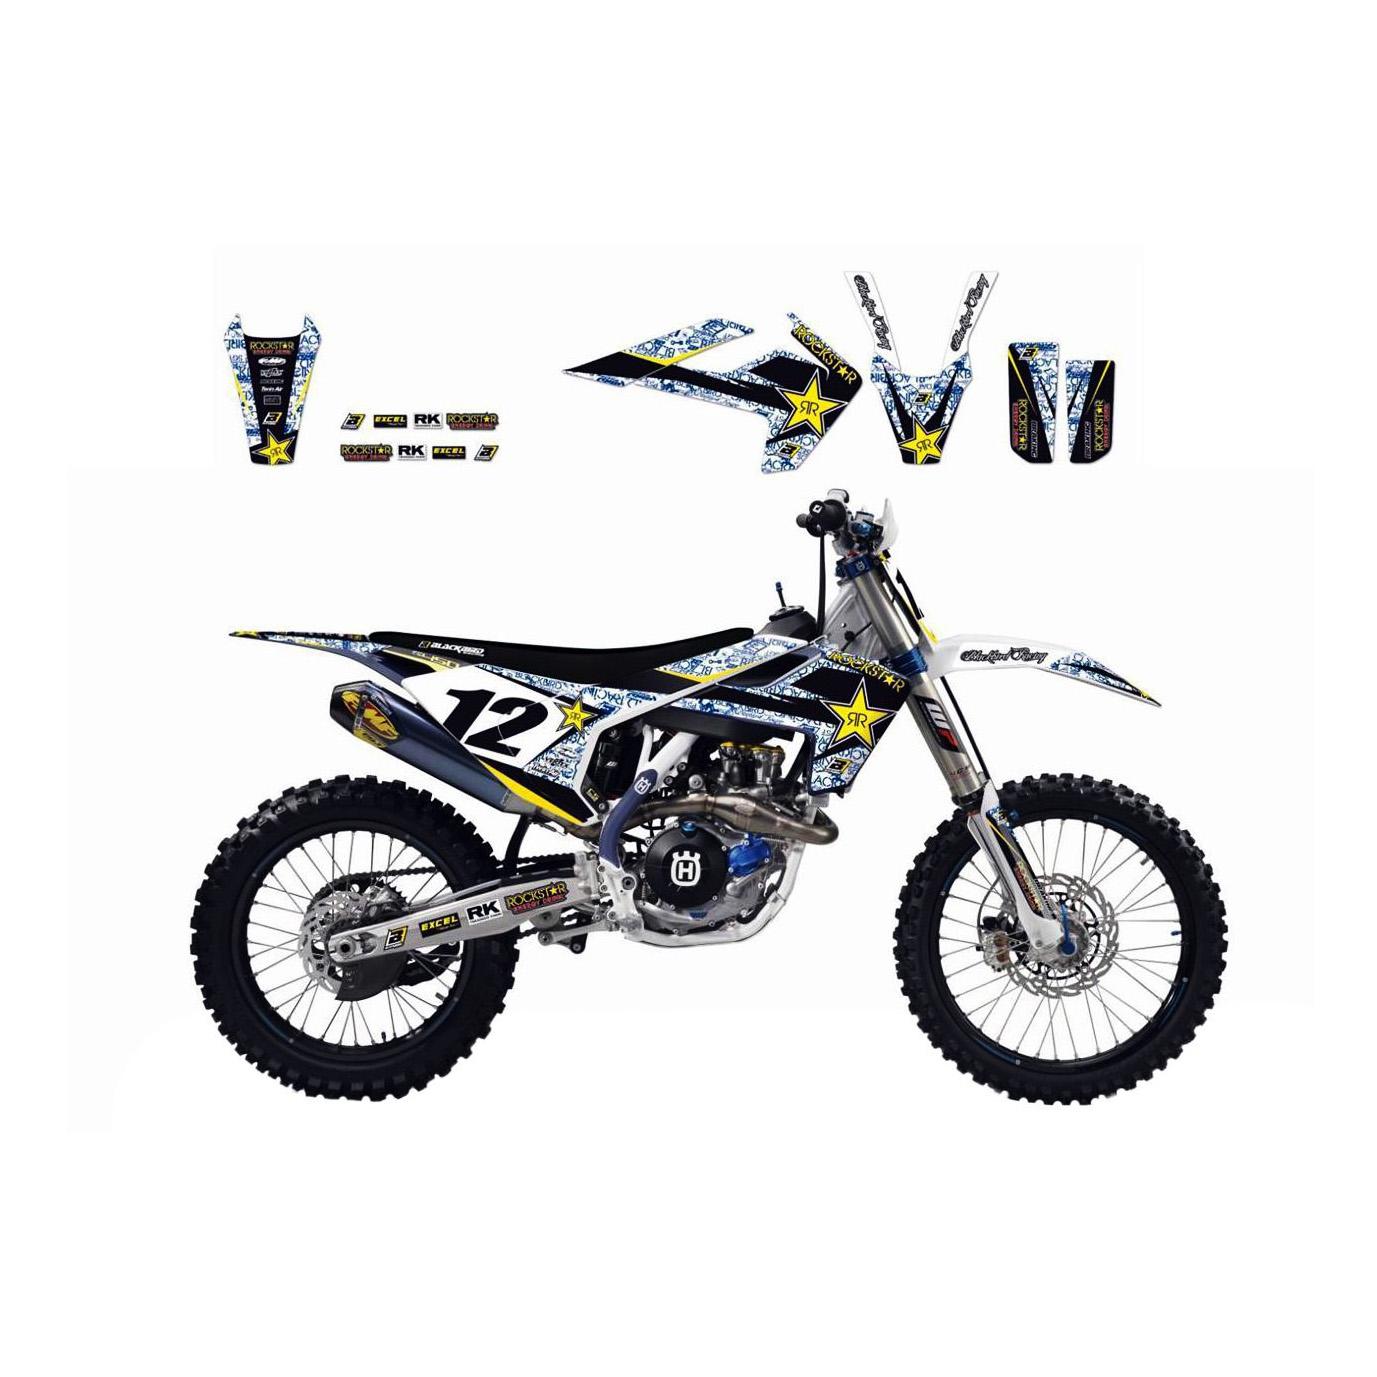 Kit déco Blackbird Rockstar Energy Husqvarna 450 FC 14-15